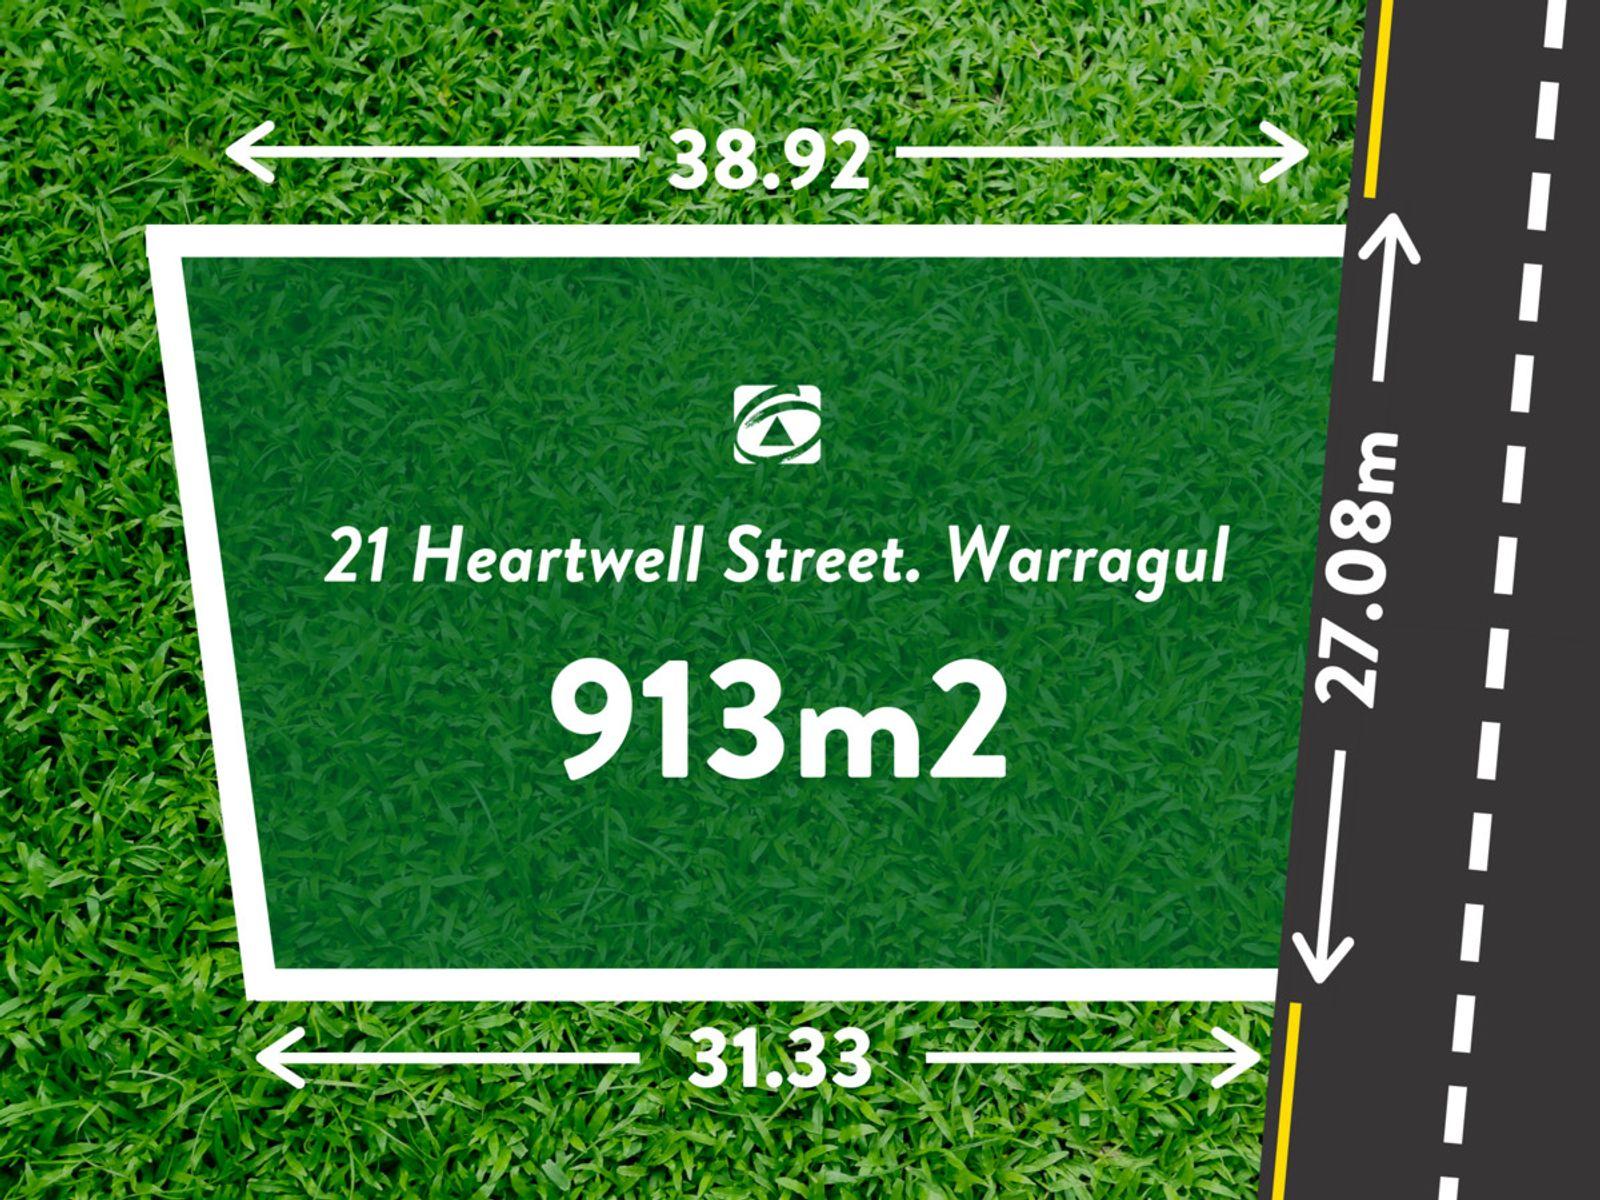 21 Heartwell Street, Warragul, VIC 3820